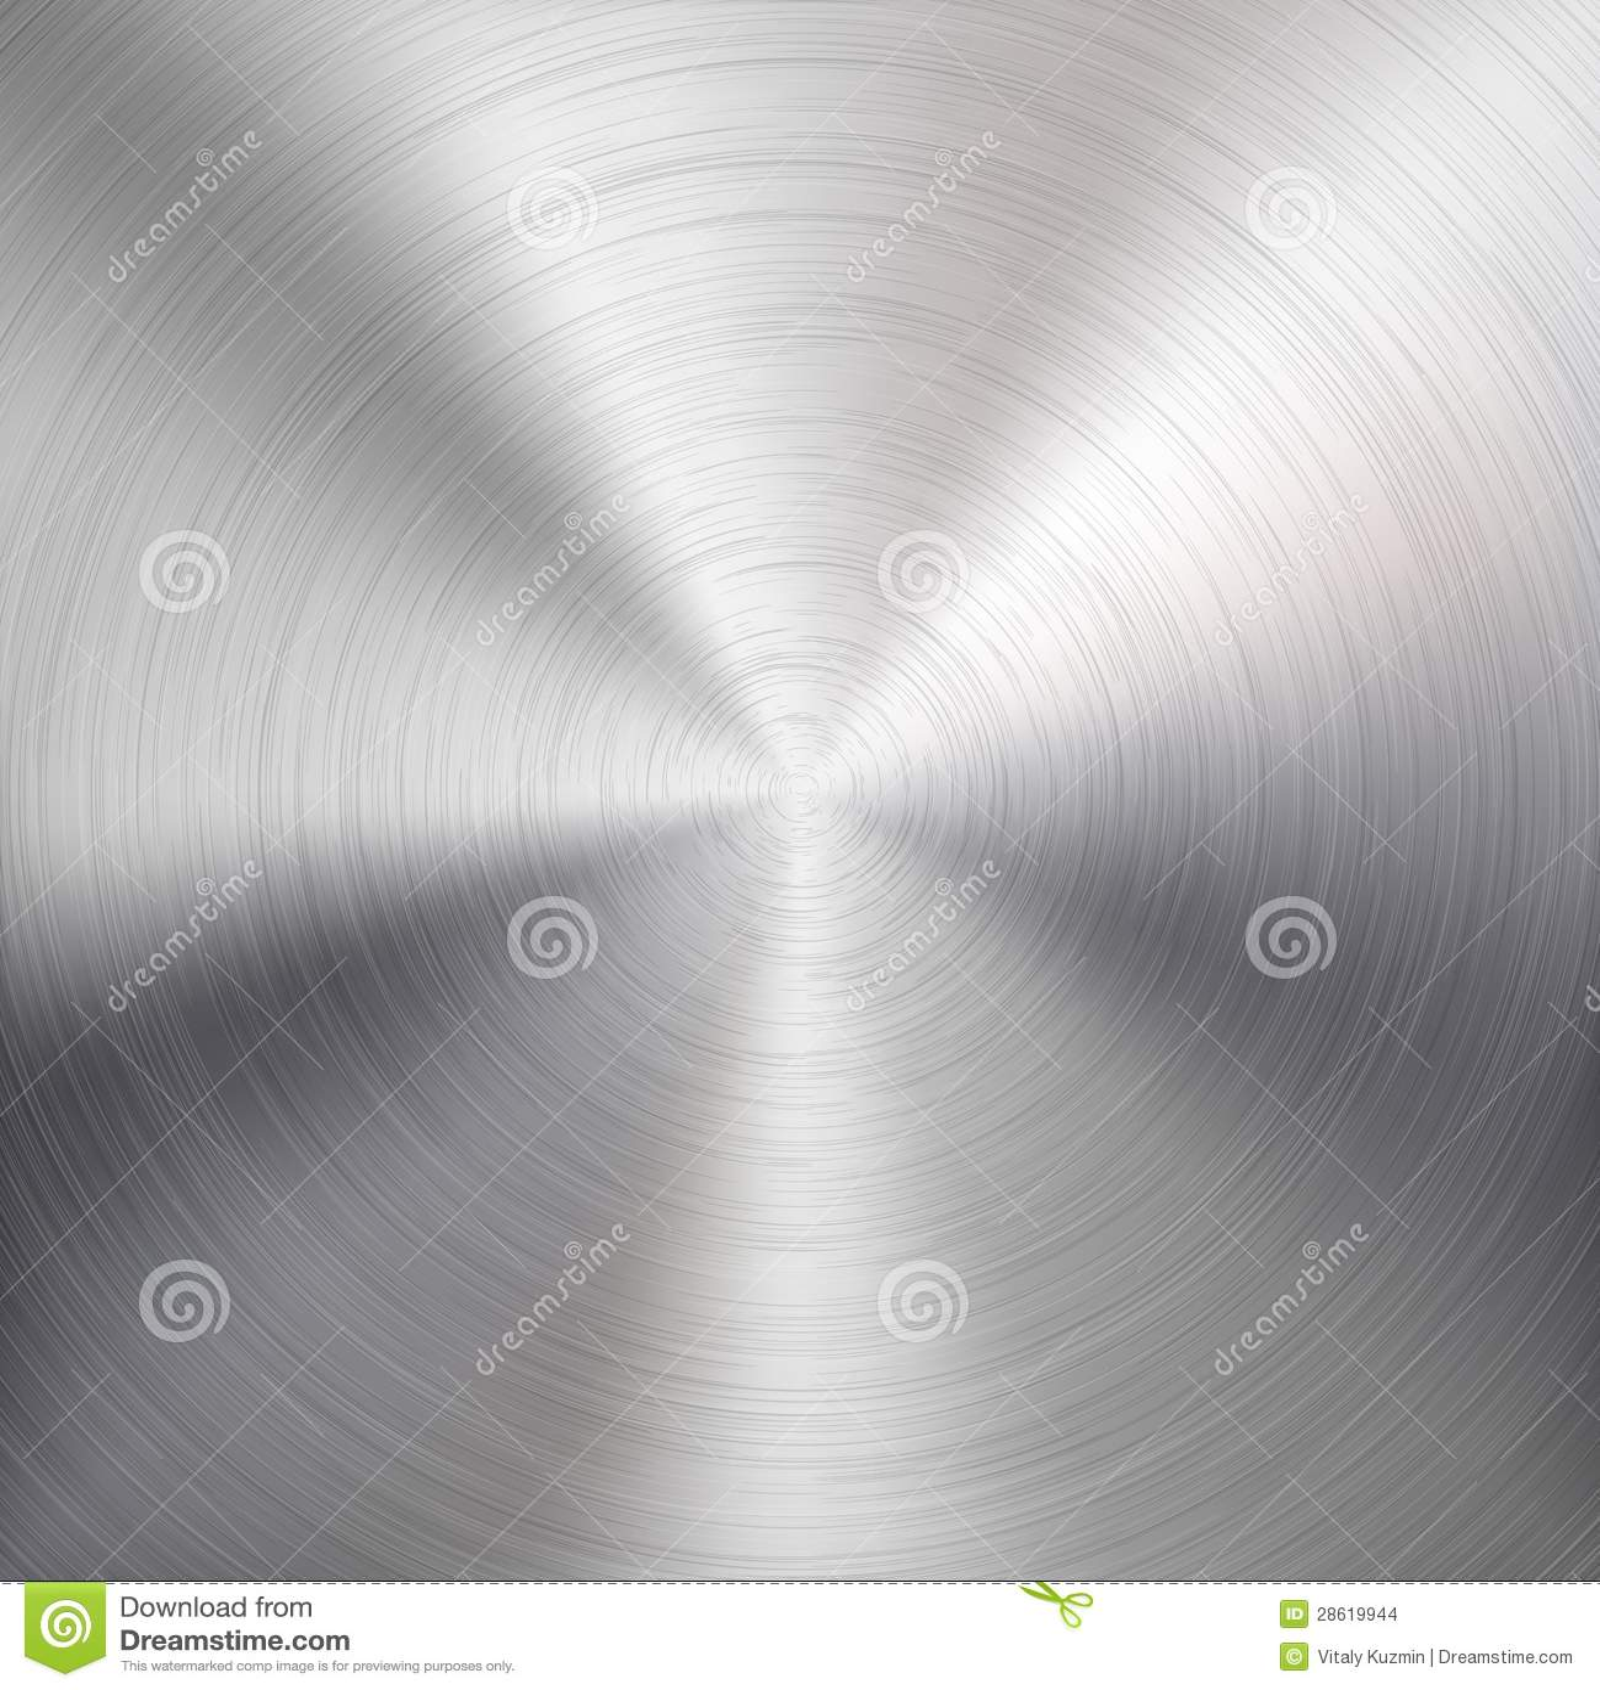 Fundo com metal circular textura escovada